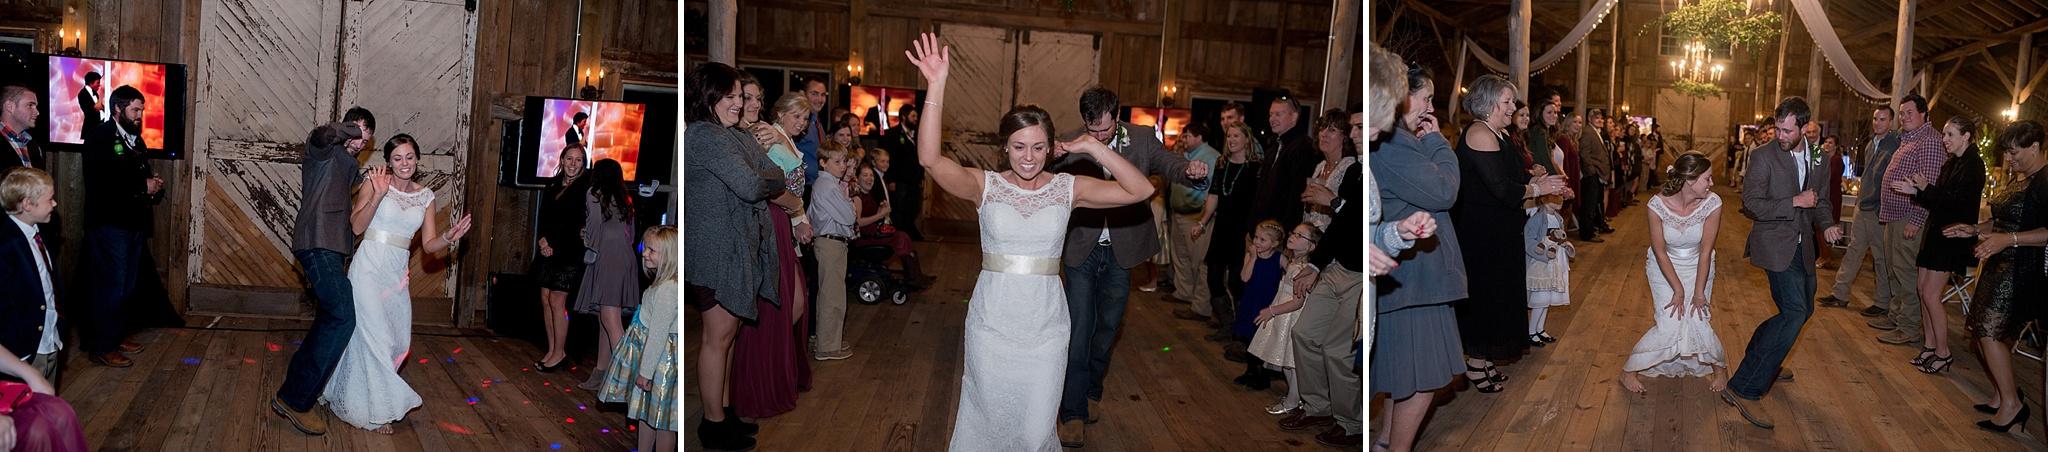 May-Lew-Farm-Farmville-NC-Wedding-Photographer-095.jpg